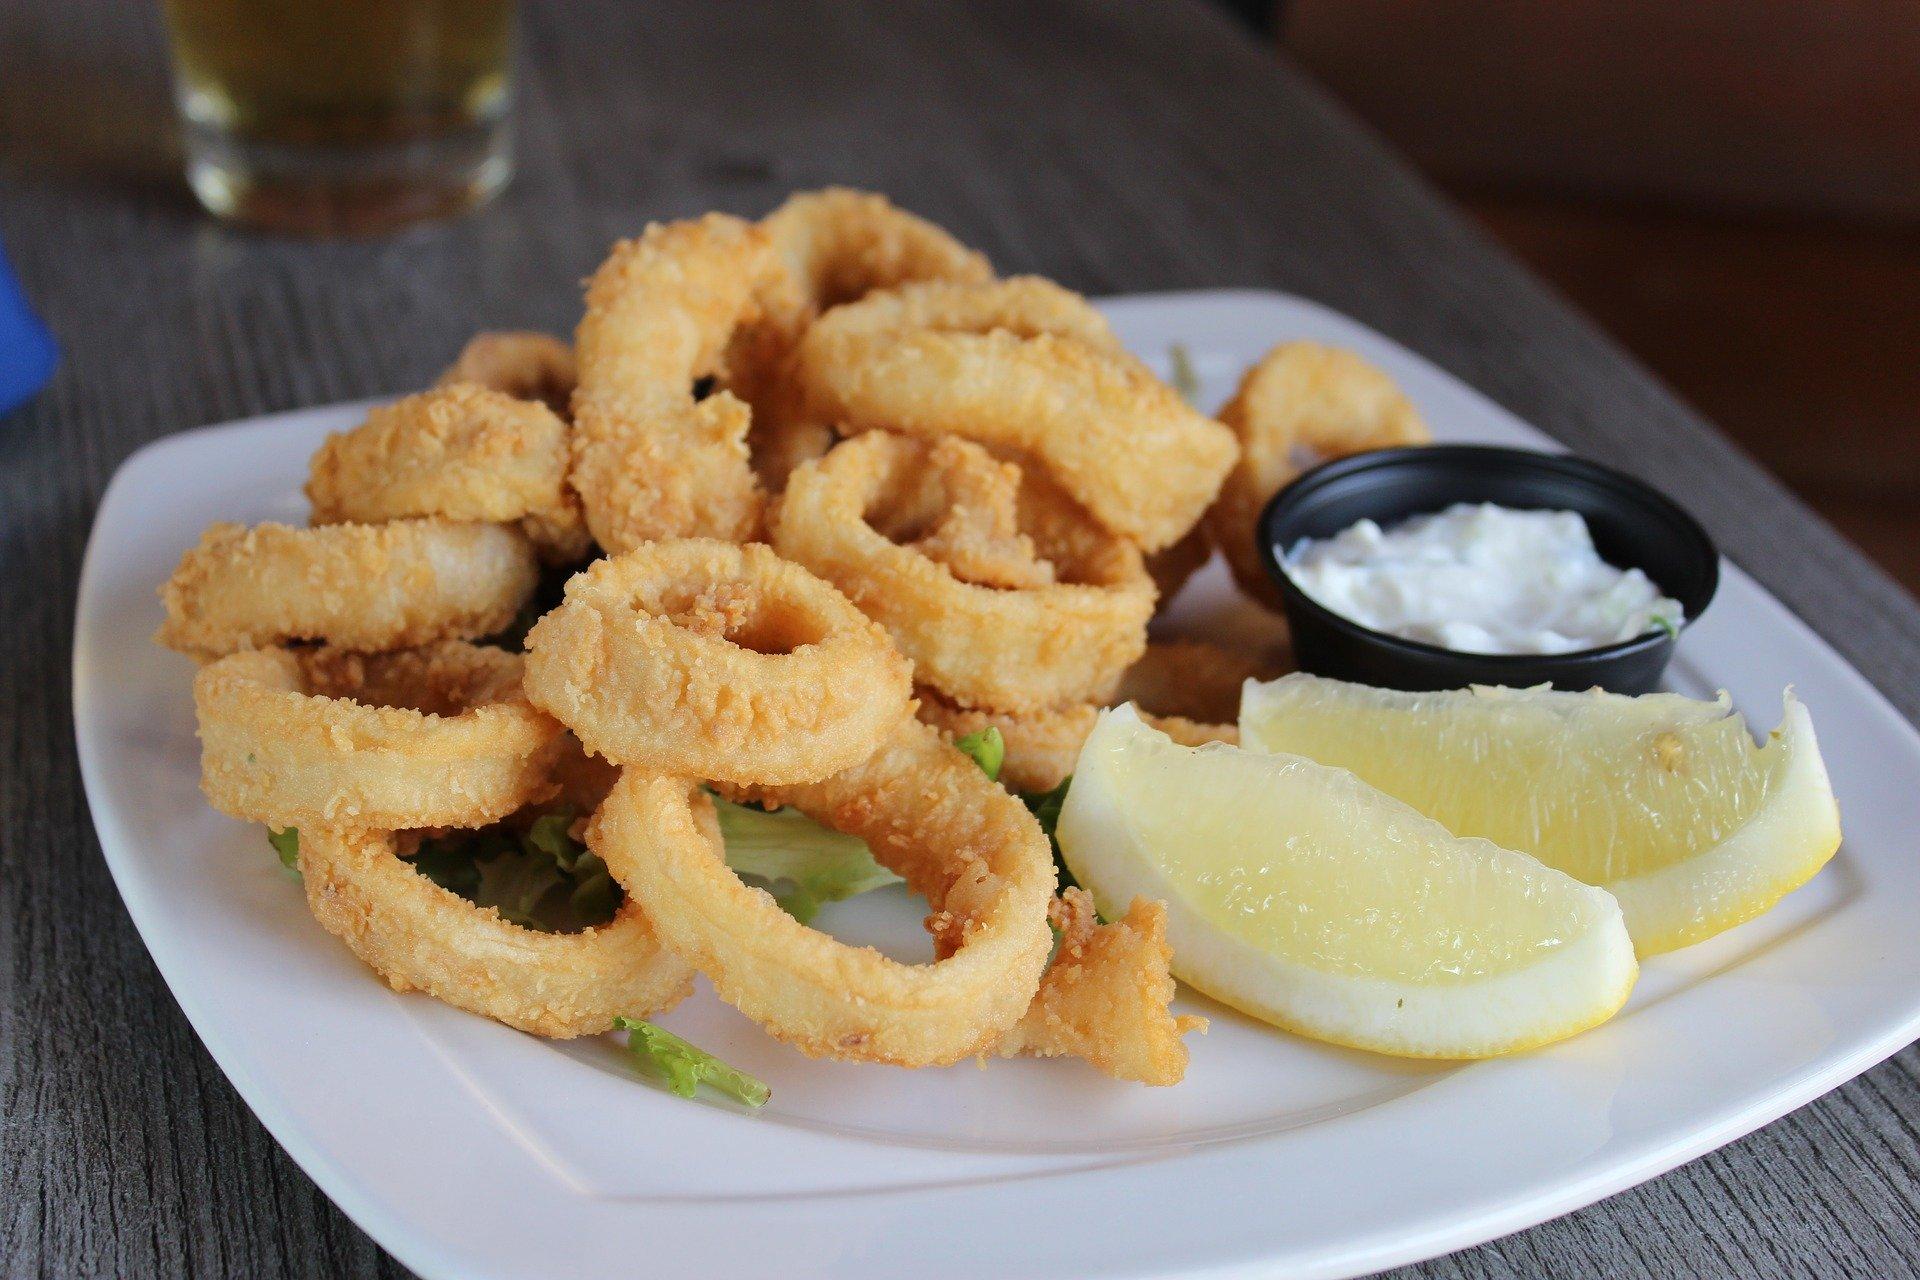 Gefrituurde Calamares met aioli – tapas